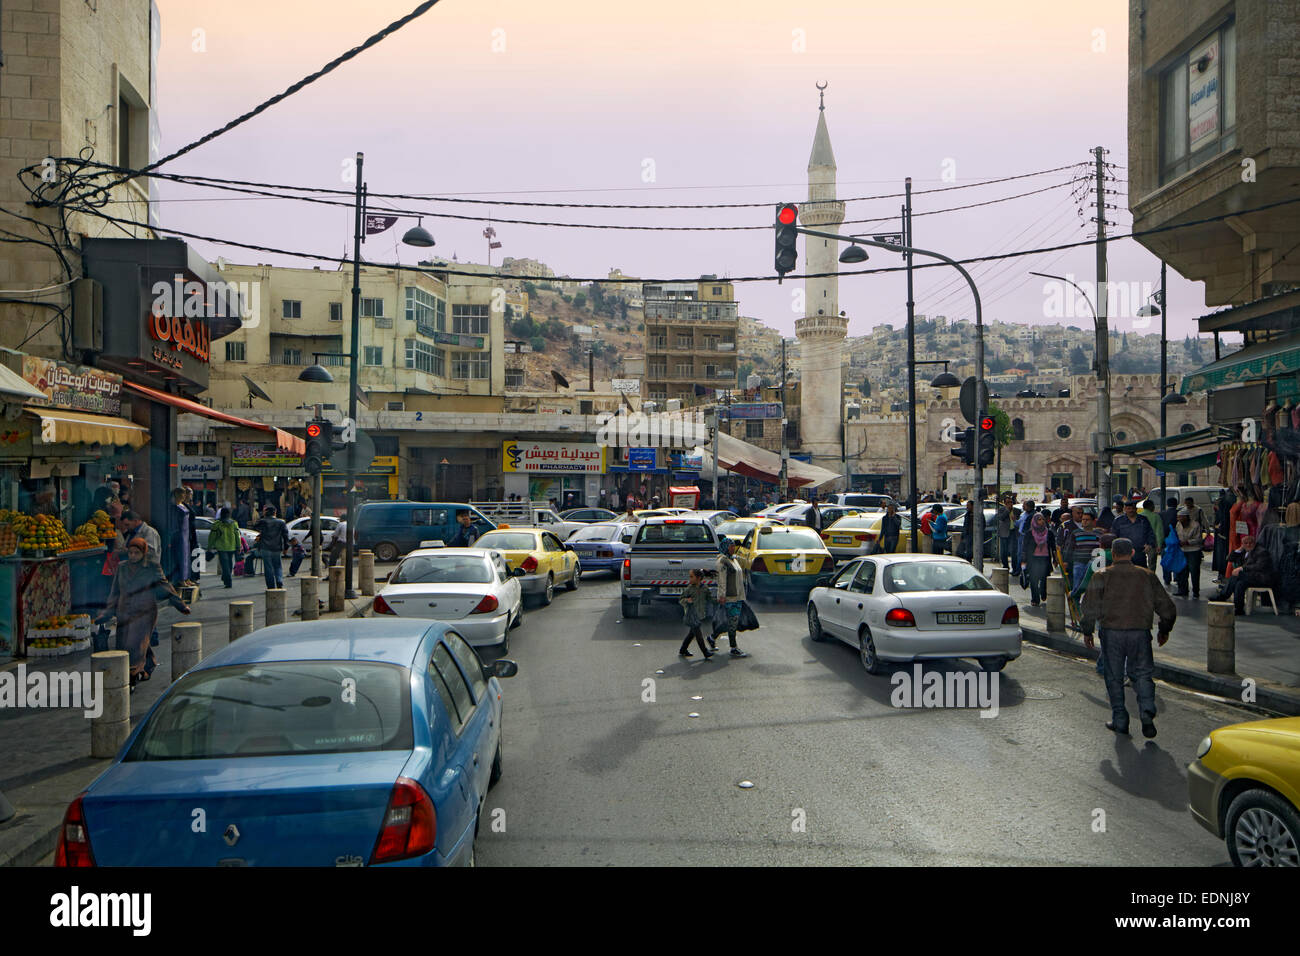 Street scene, road, mosque, Amman, Jordan - Stock Image